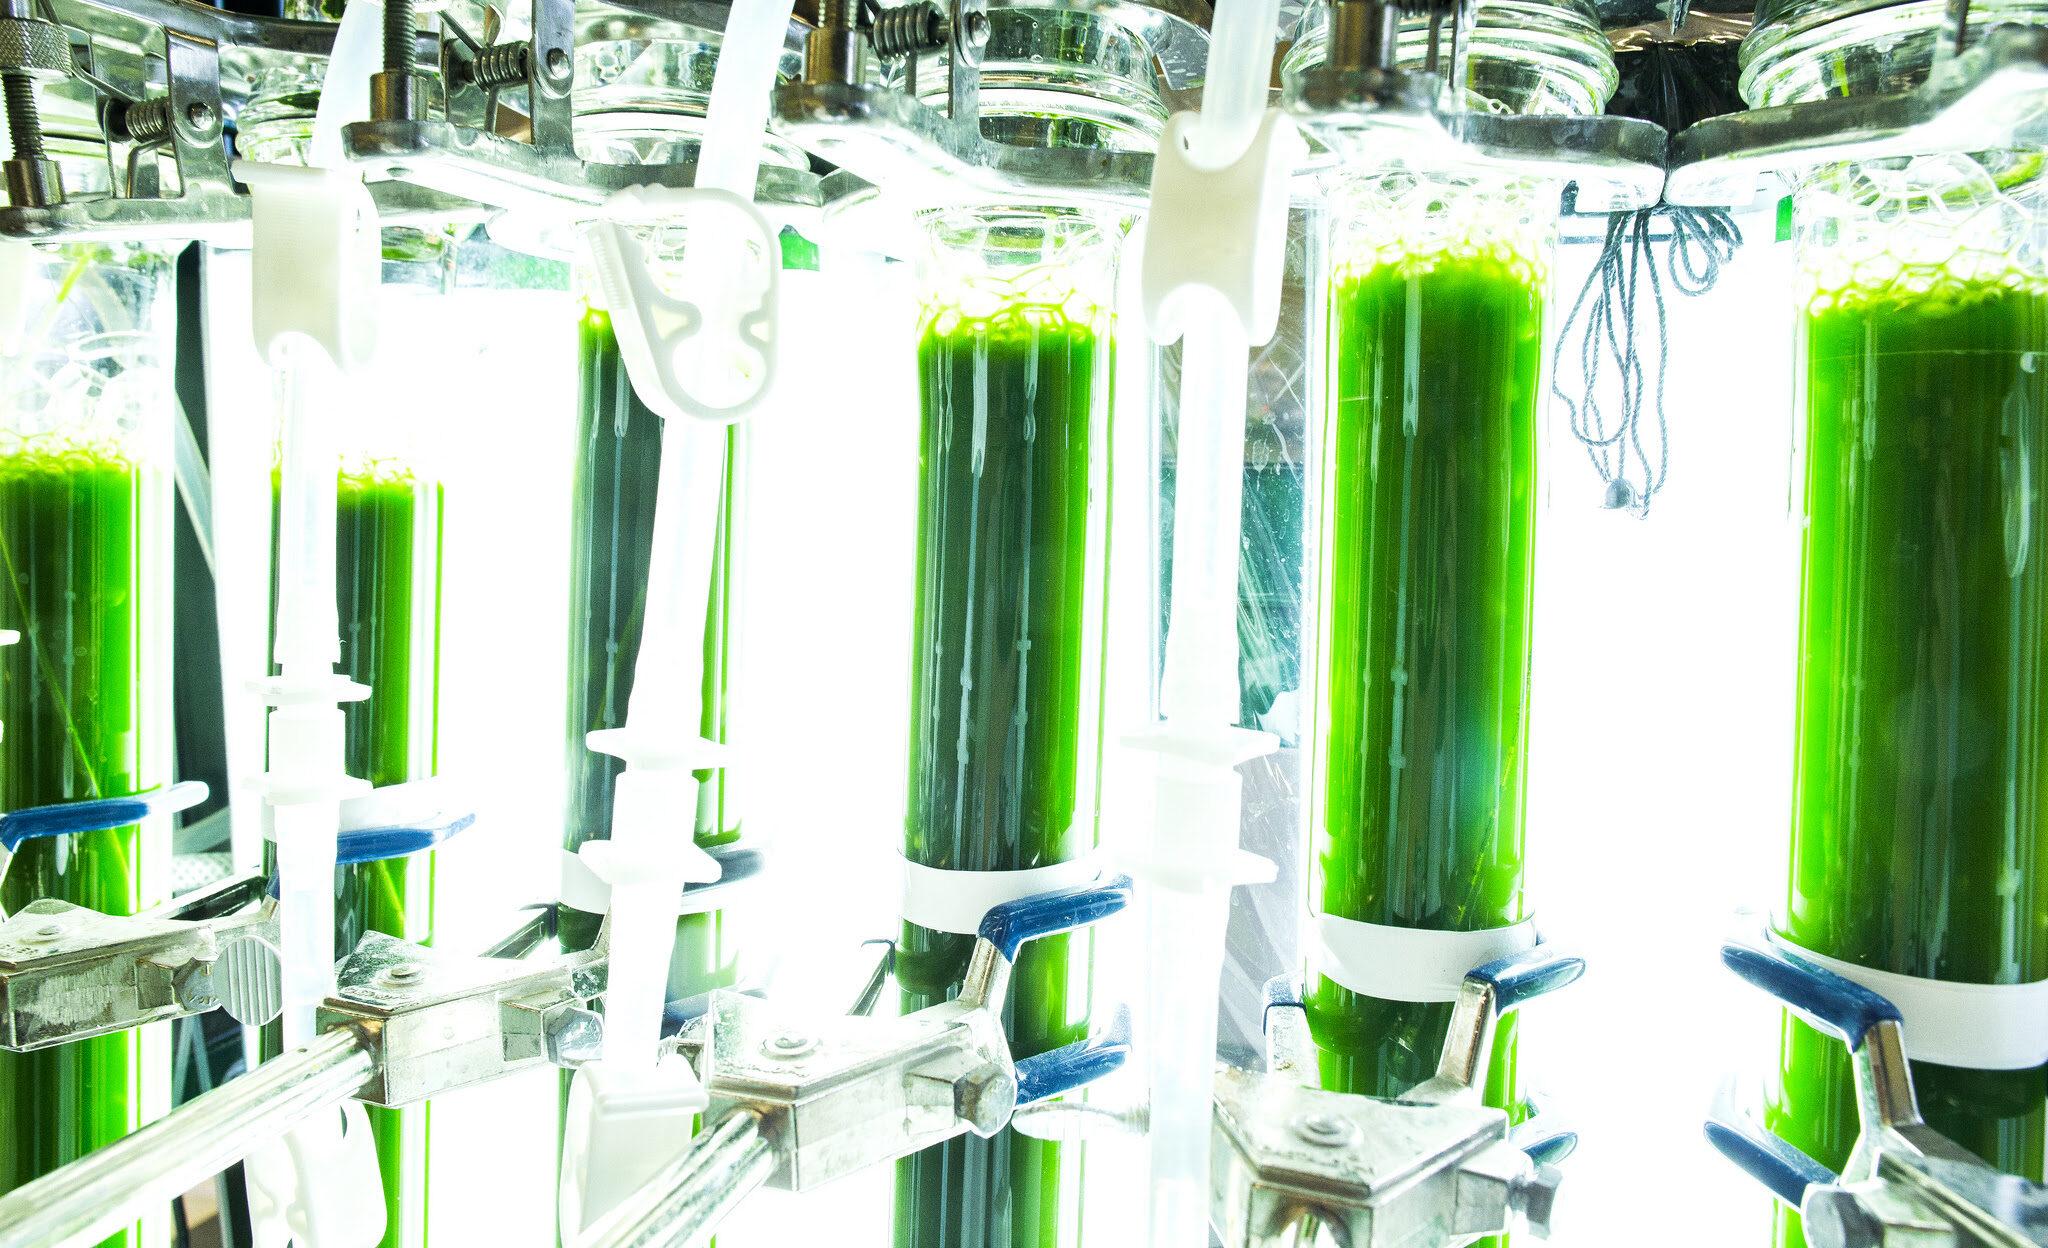 Tubes of algae